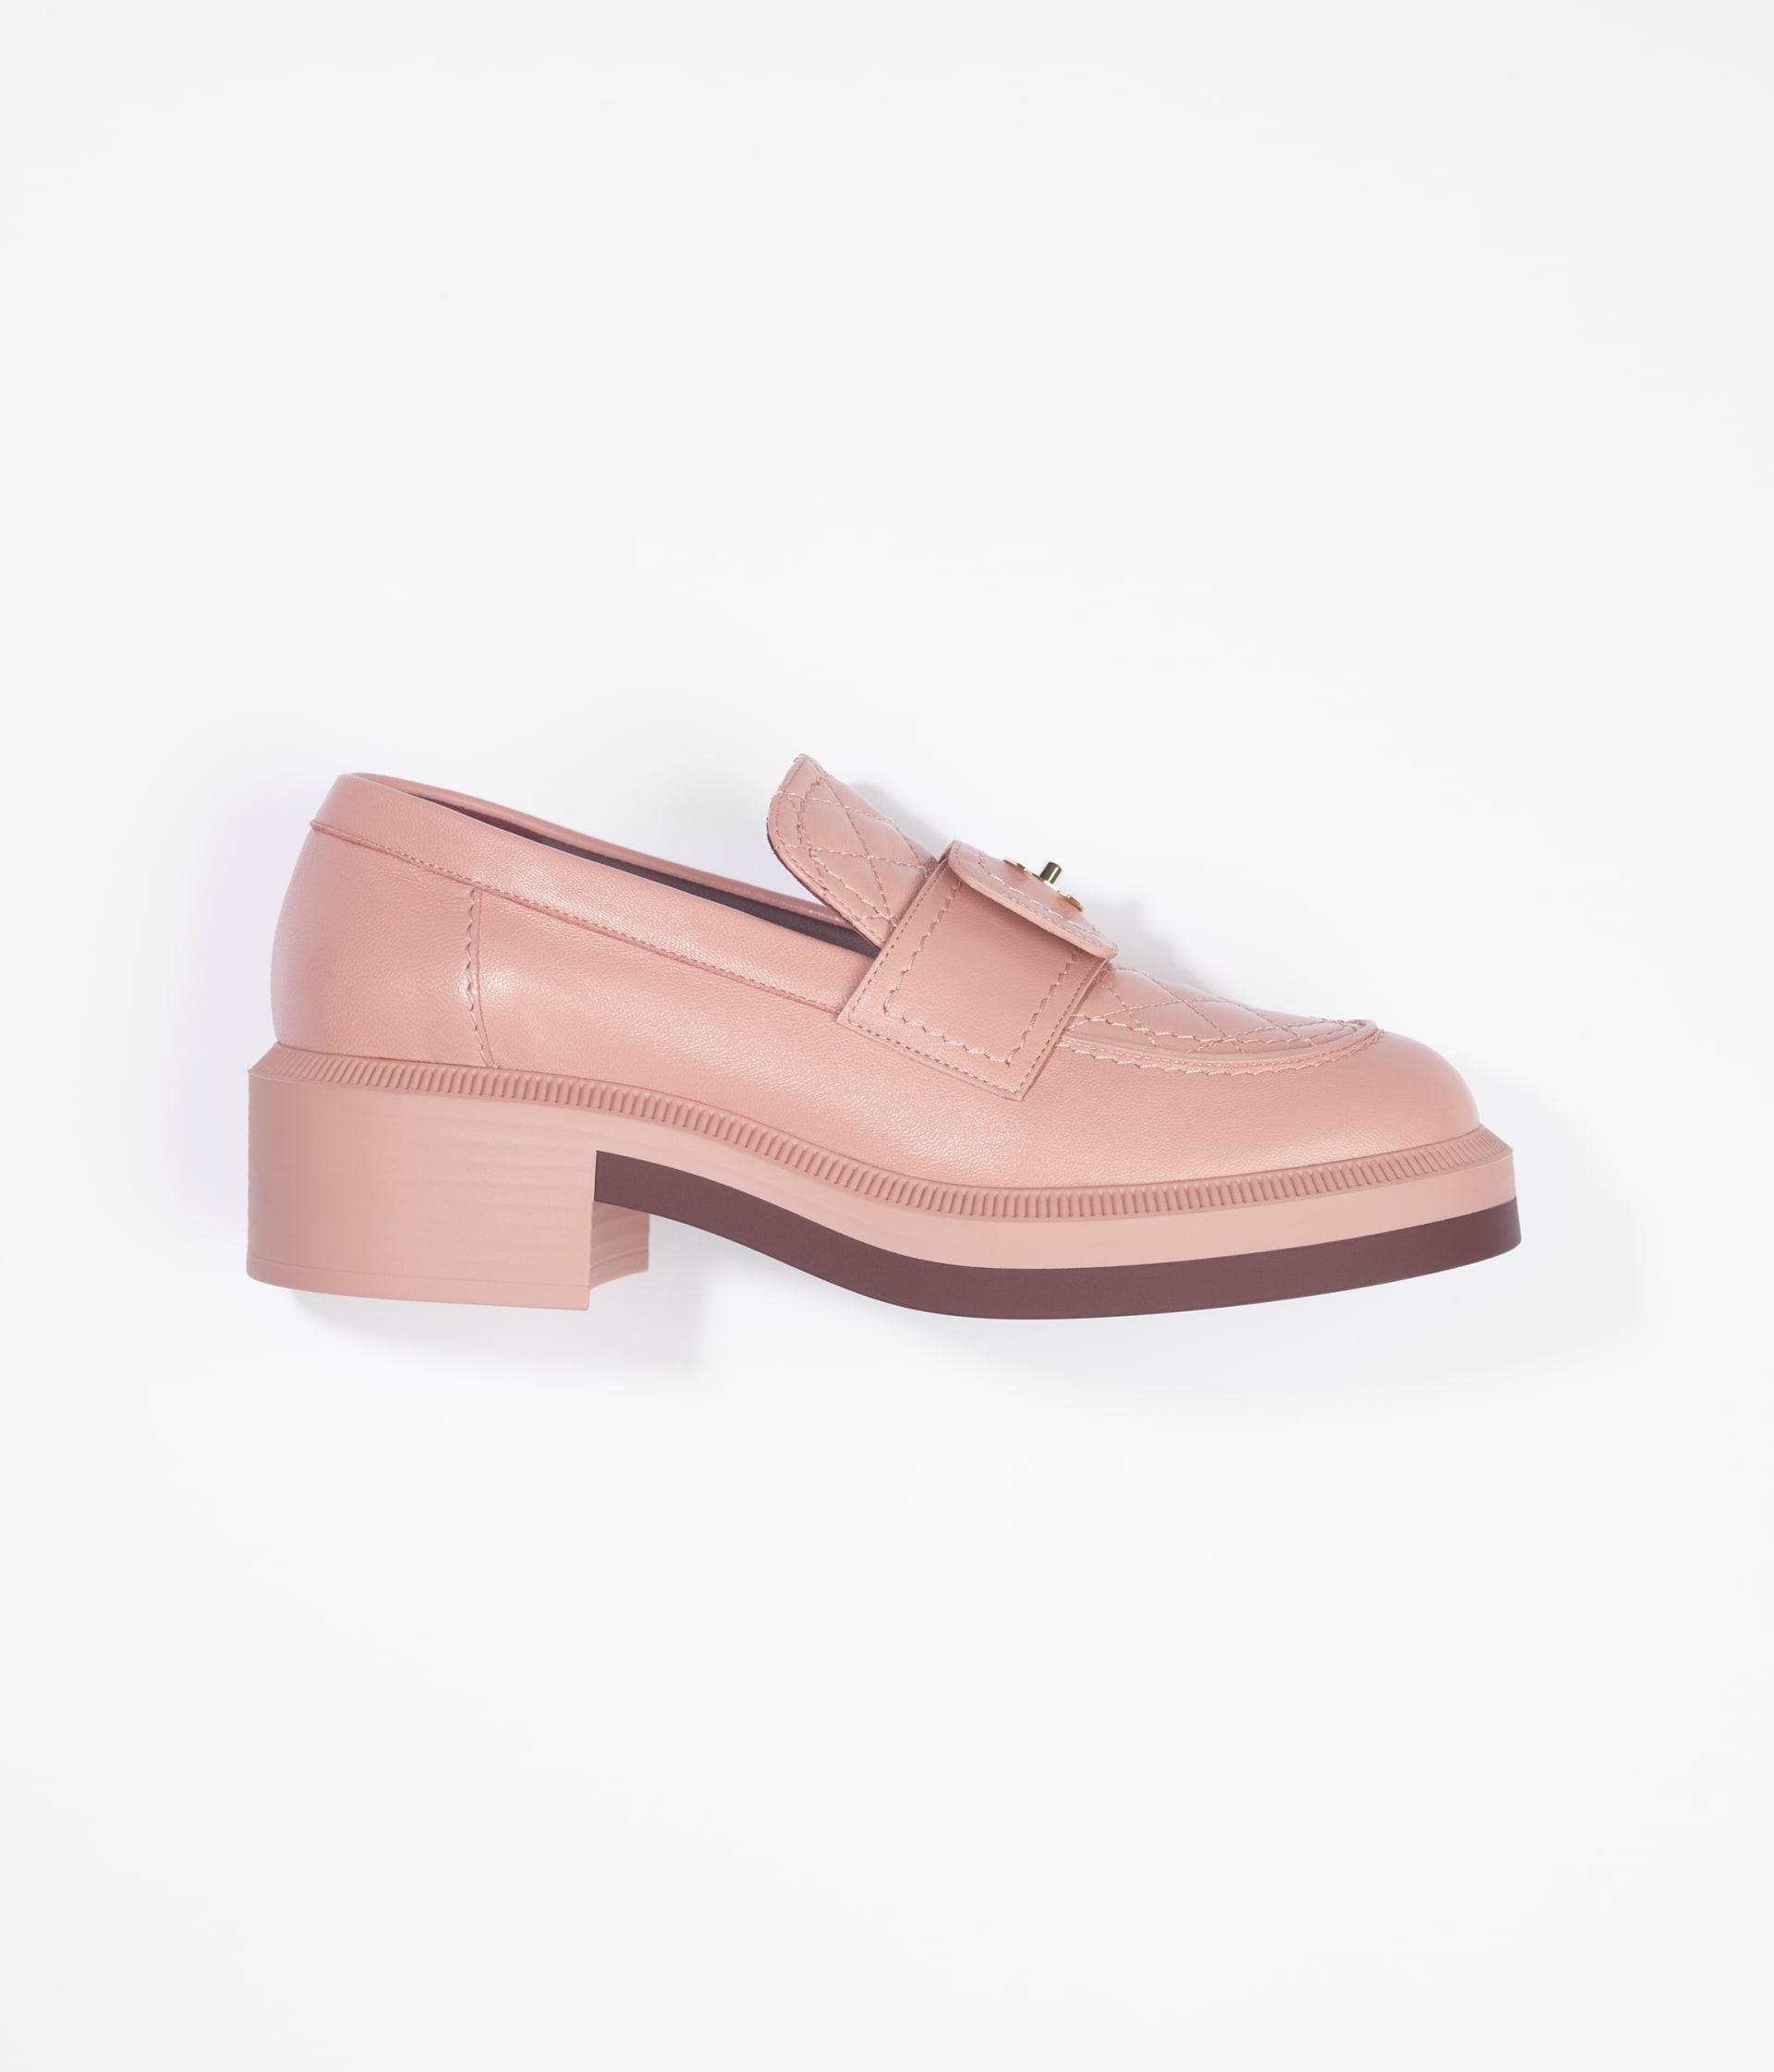 image 1 - Loafers - Lambskin - Dark Pink